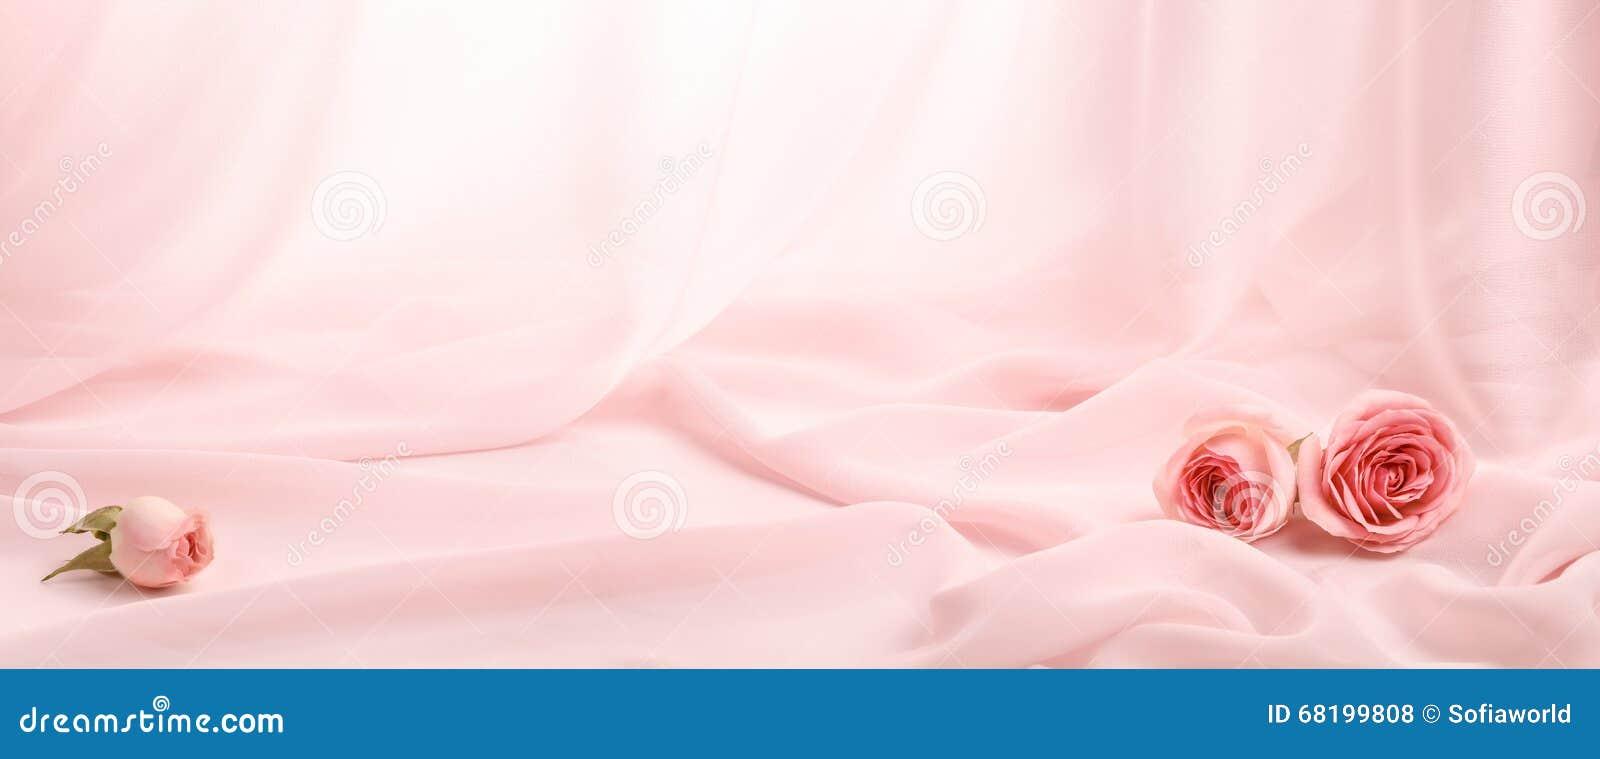 Rosas cor-de-rosa na seda macia